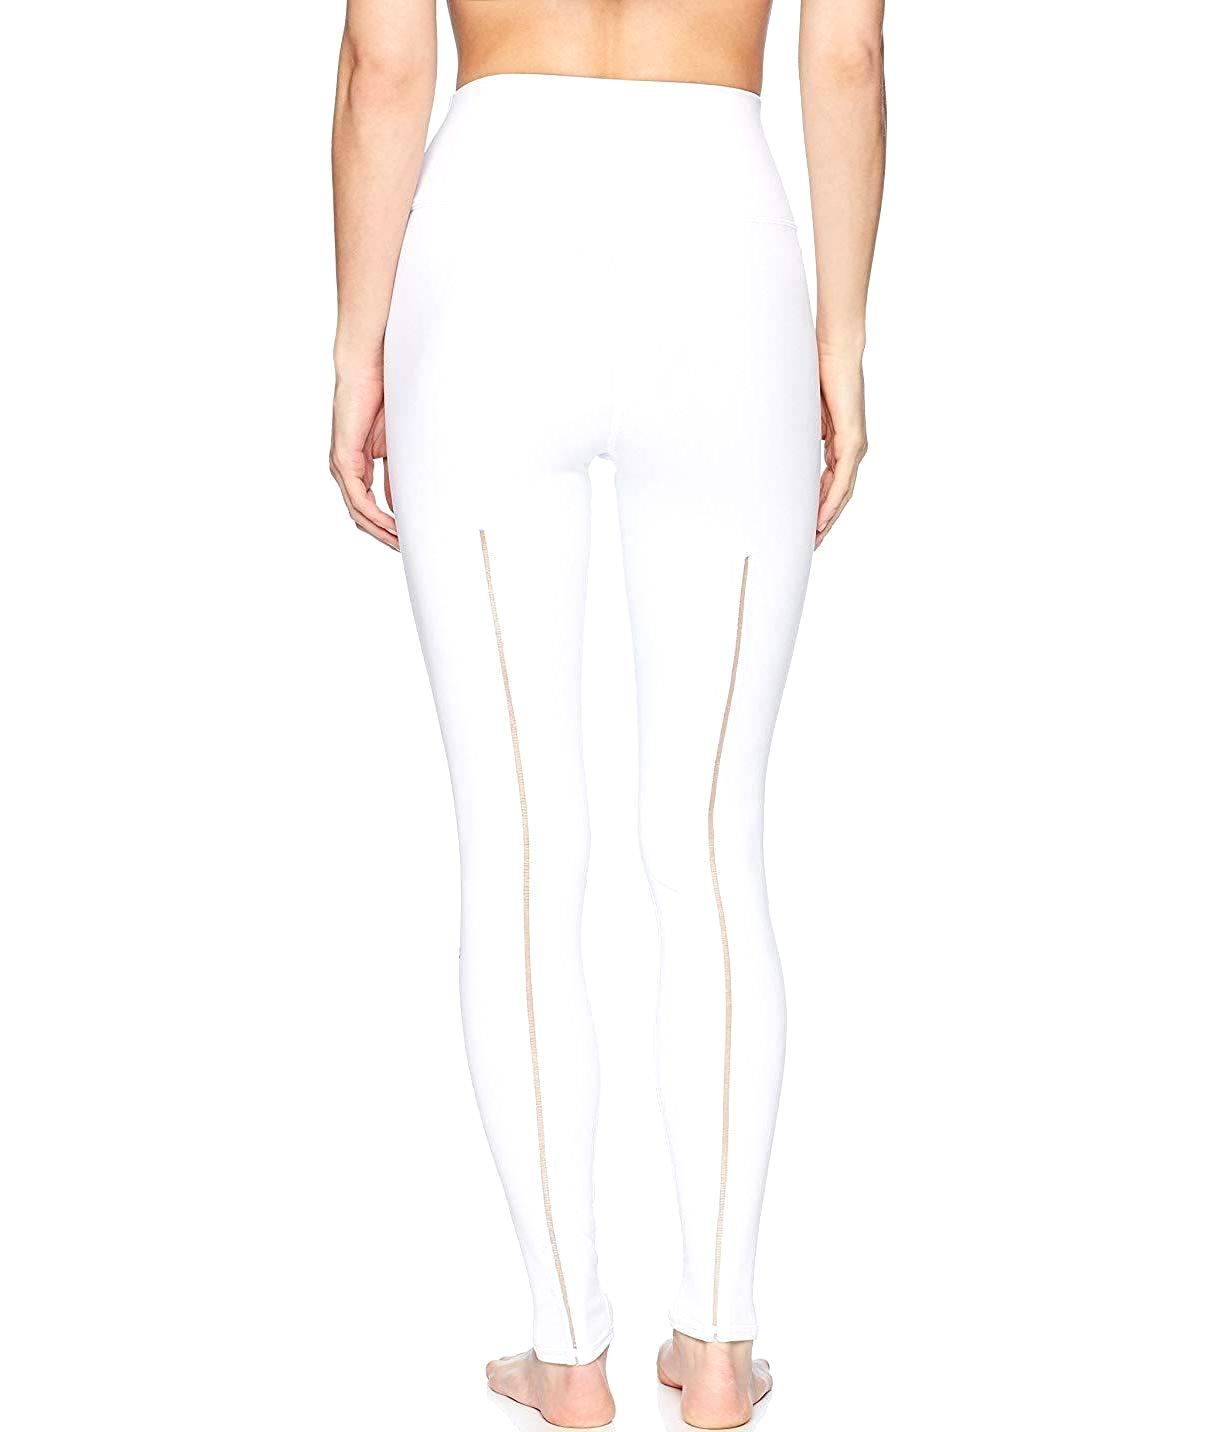 2f6bb7fbbb High-Waist Dash Legging in White - Authentic Designer Clothes